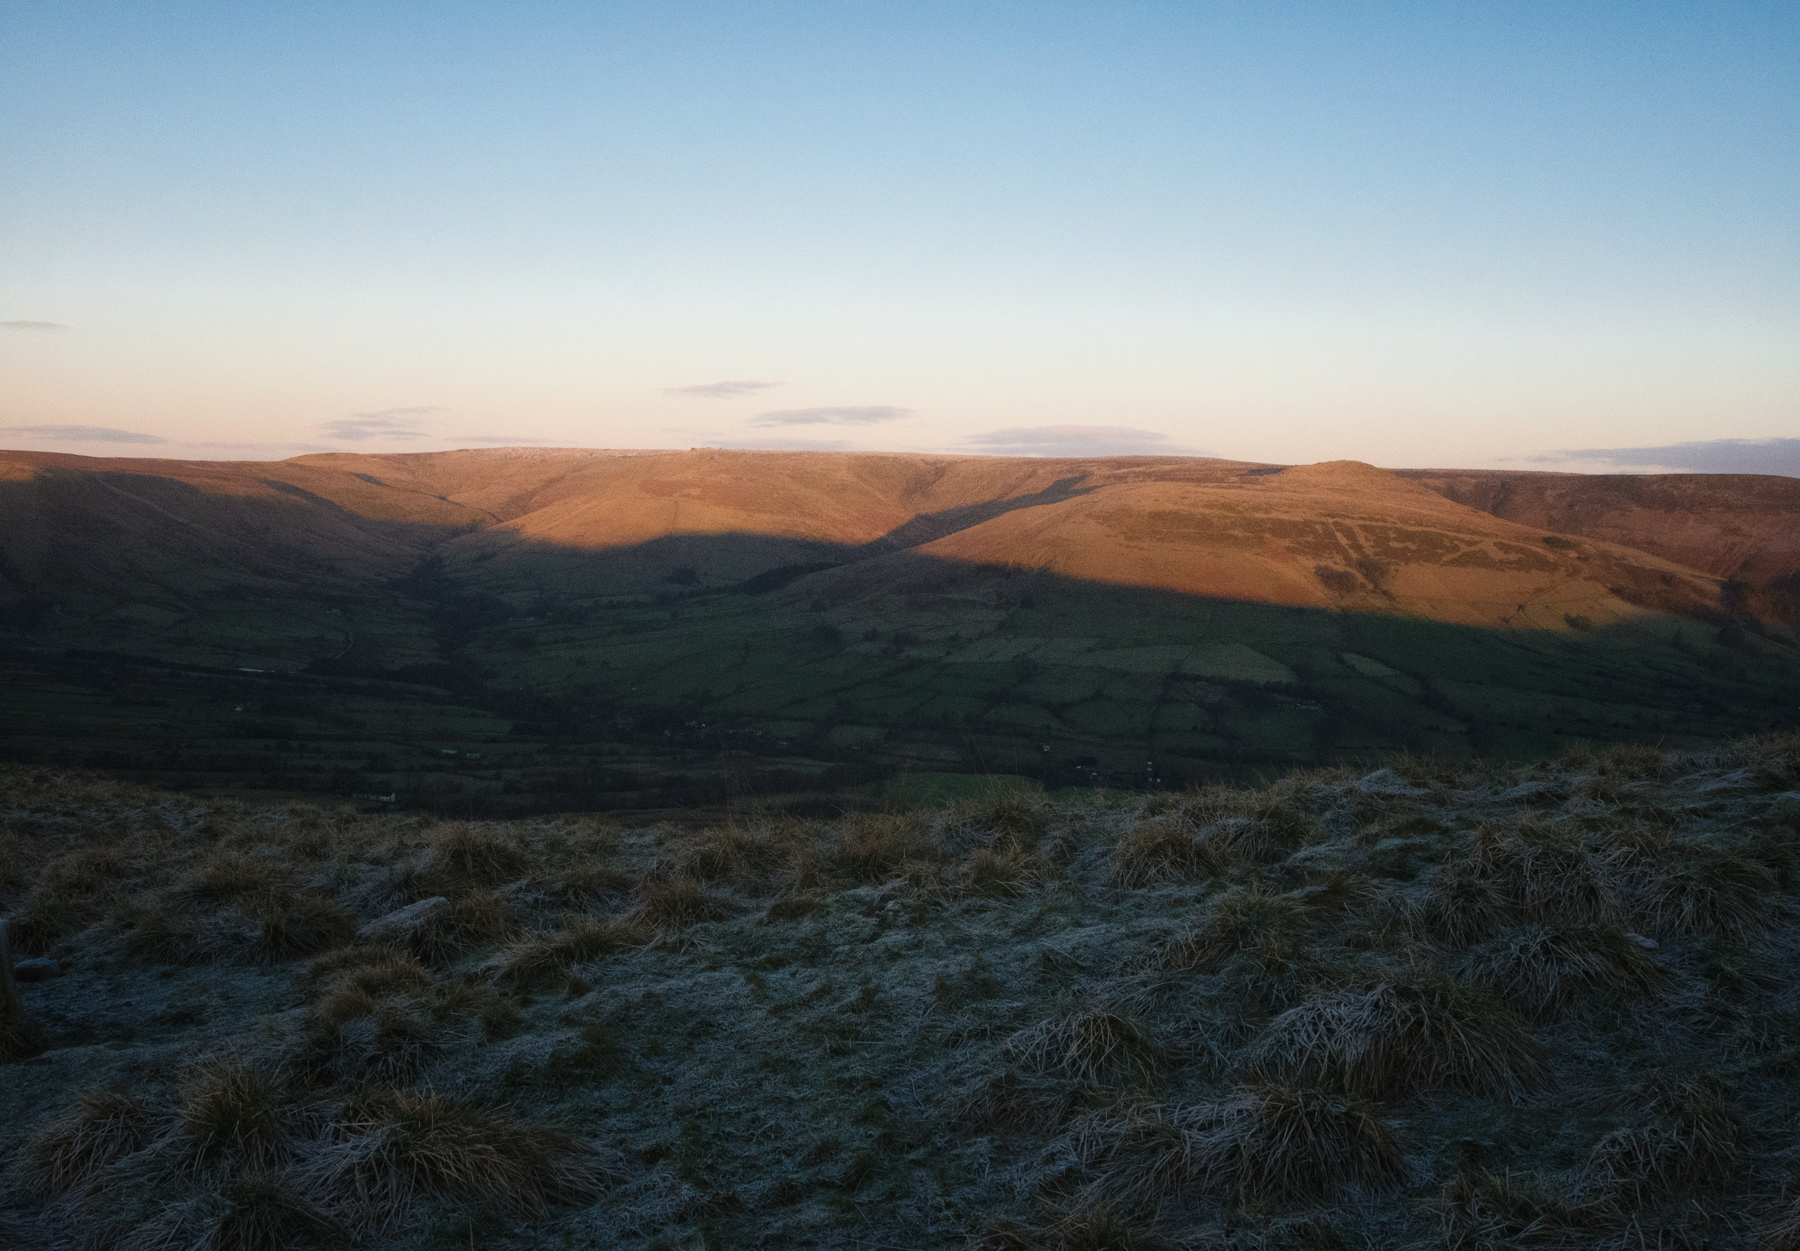 Sun shining on hills